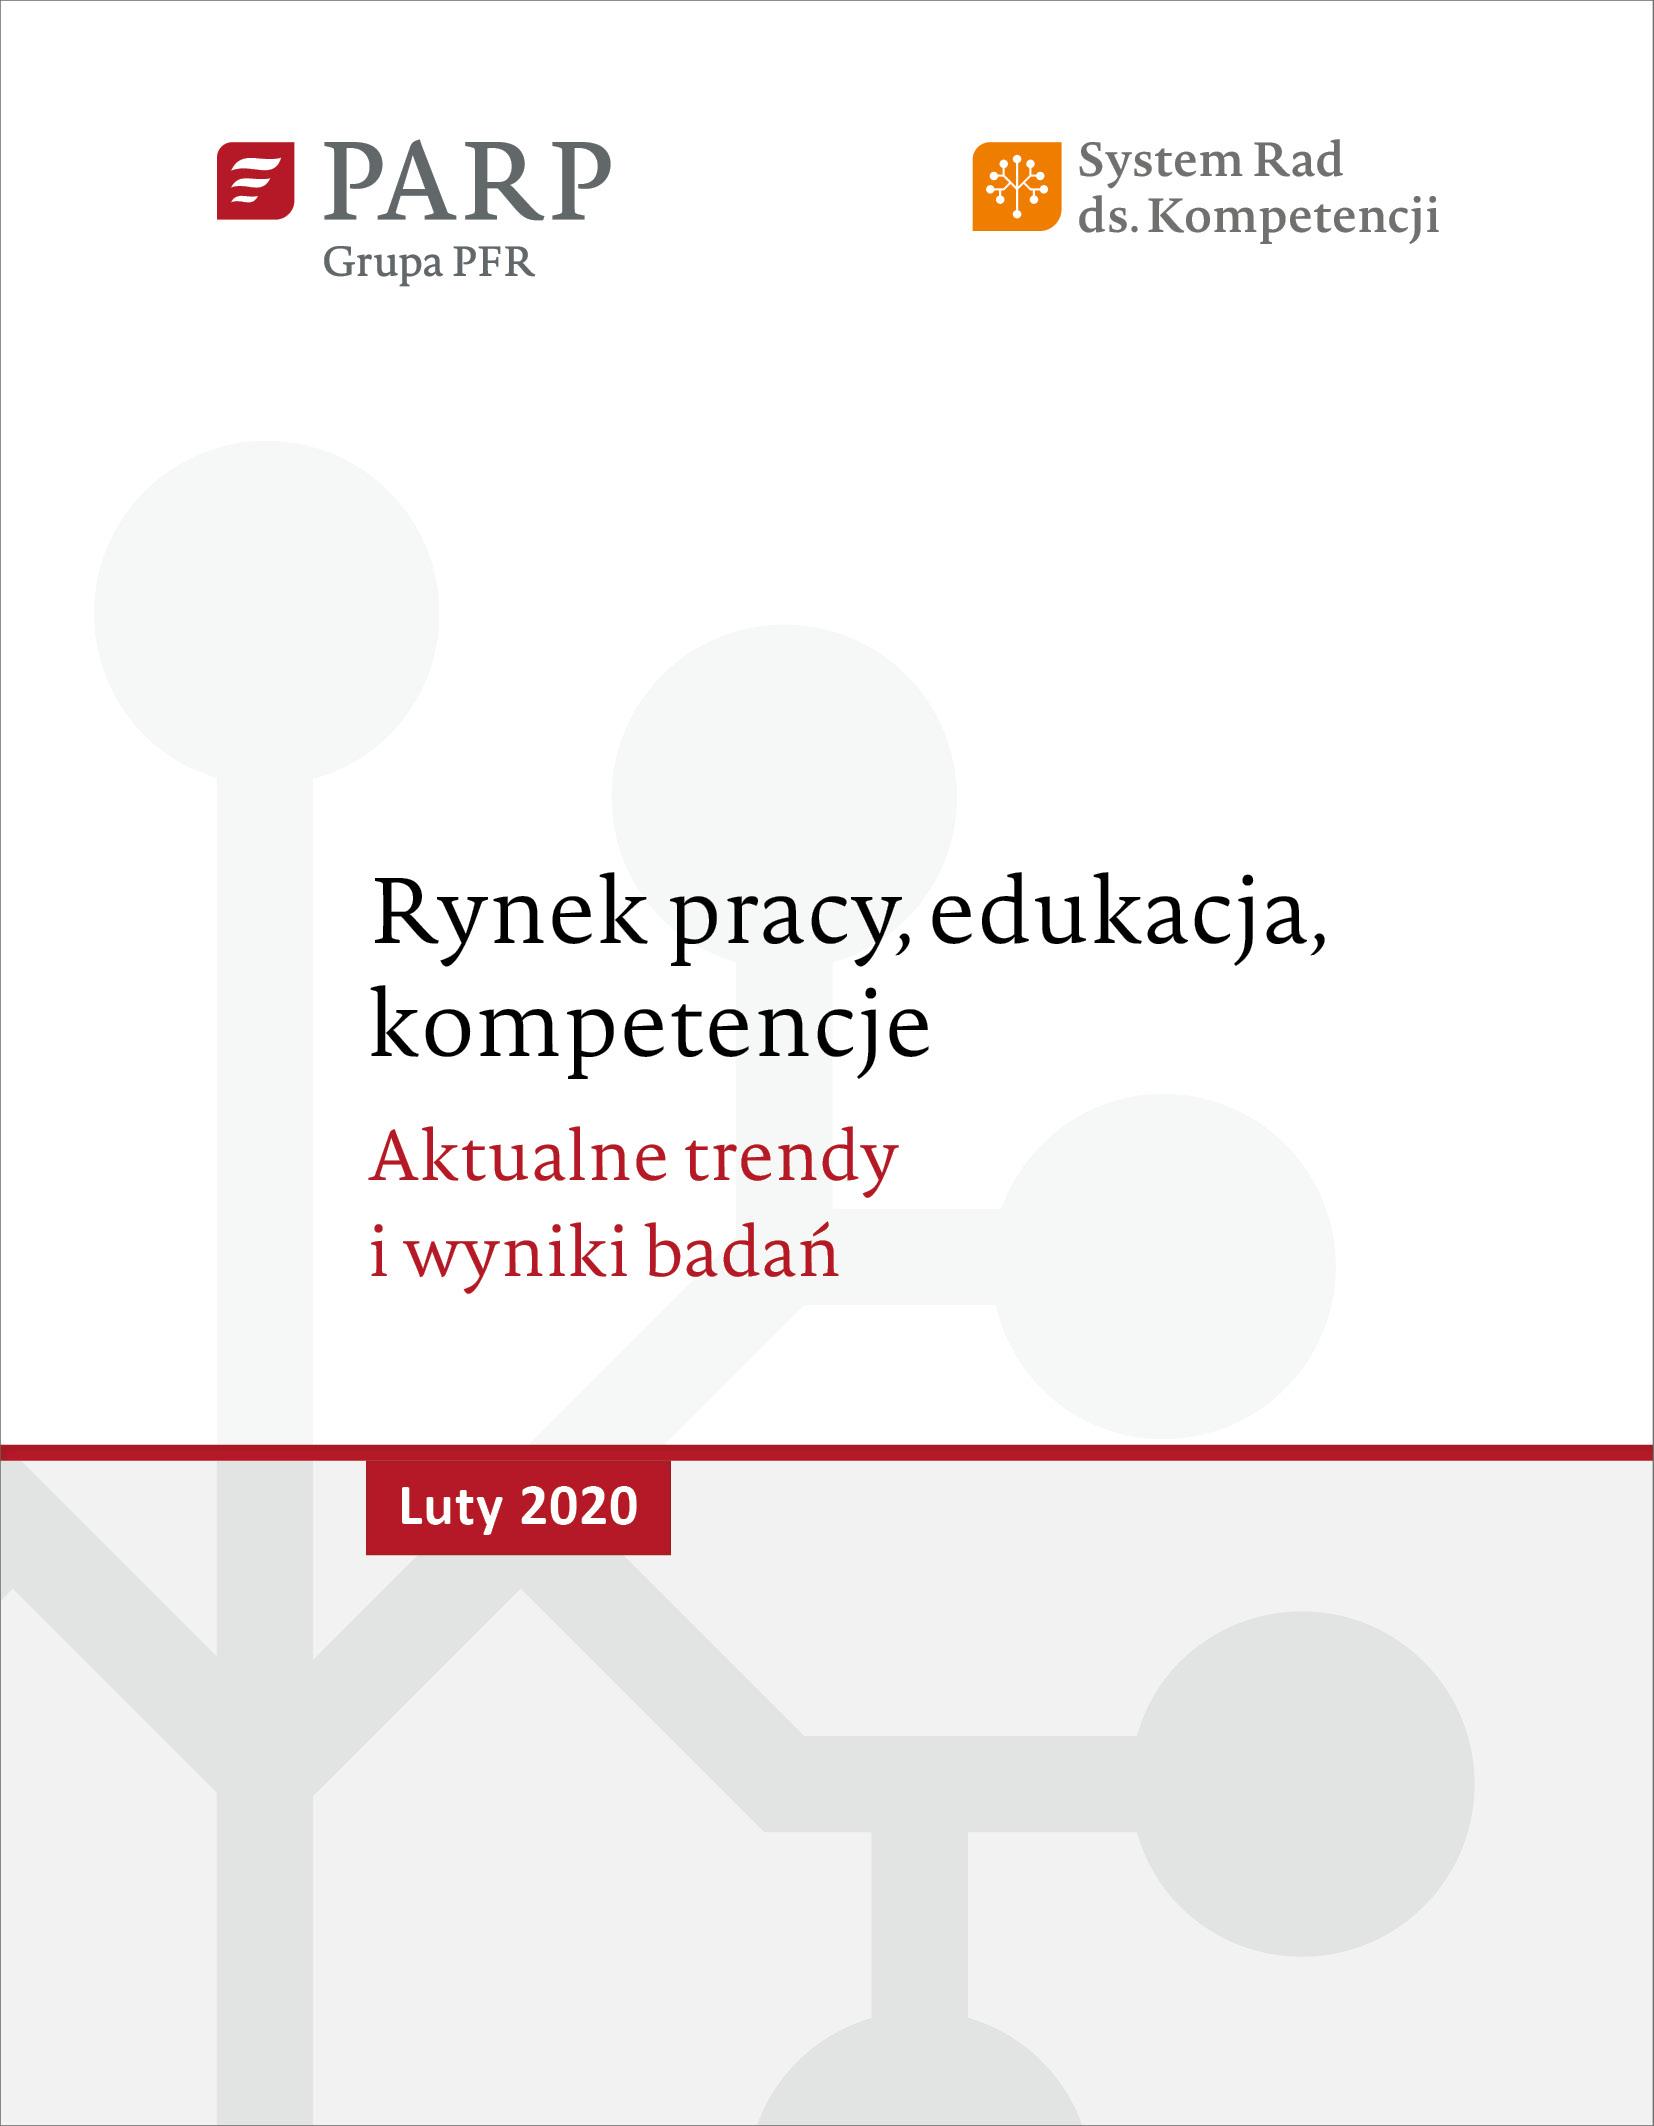 Rynek pracy, edukacja, kompetencje - luty 2020